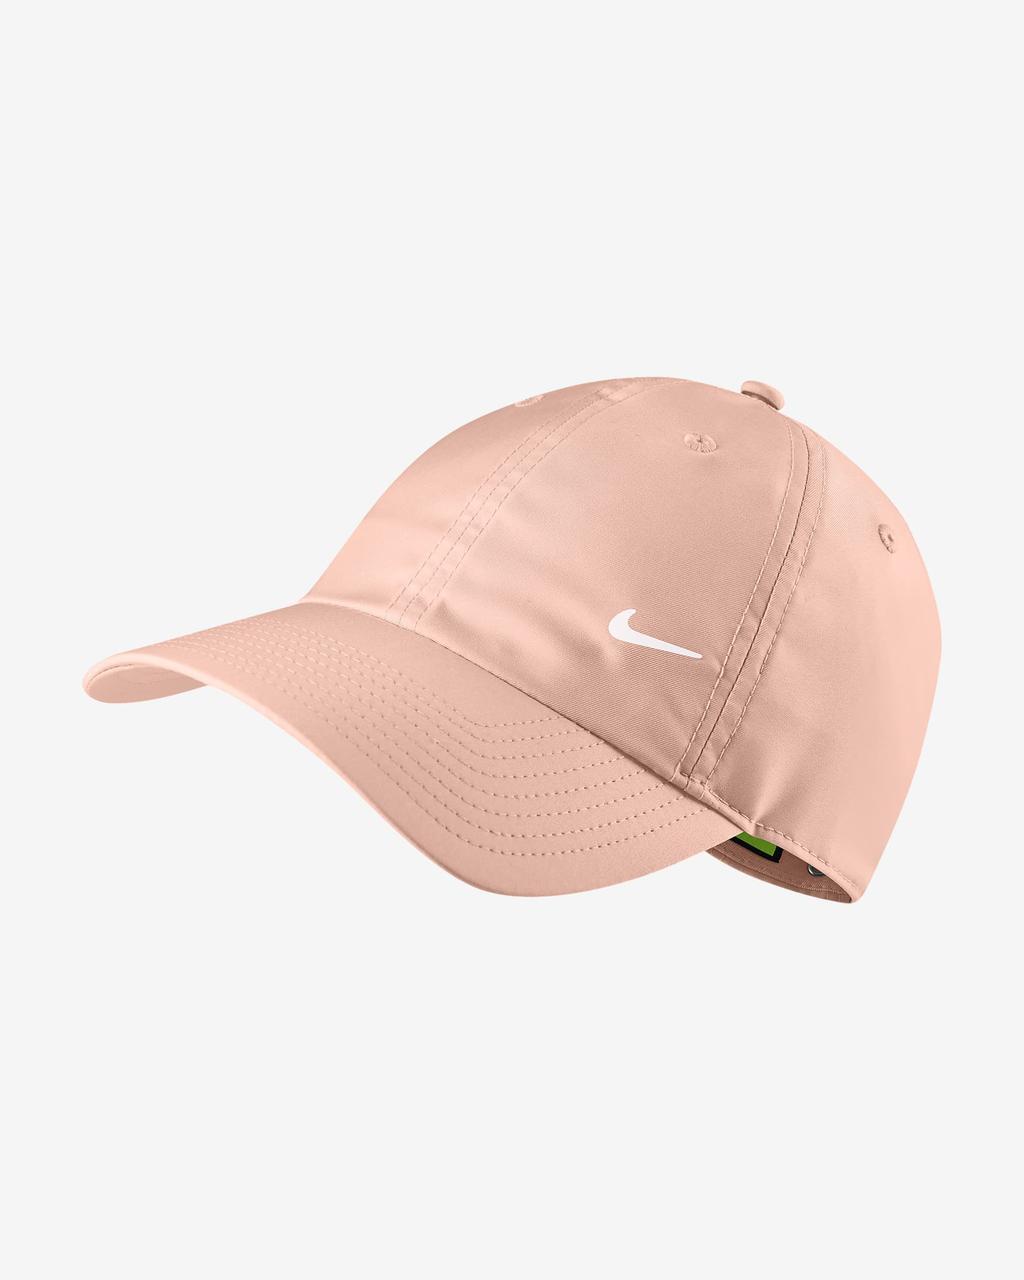 Кепка Nike Sportswear Heritage 86 943092-800